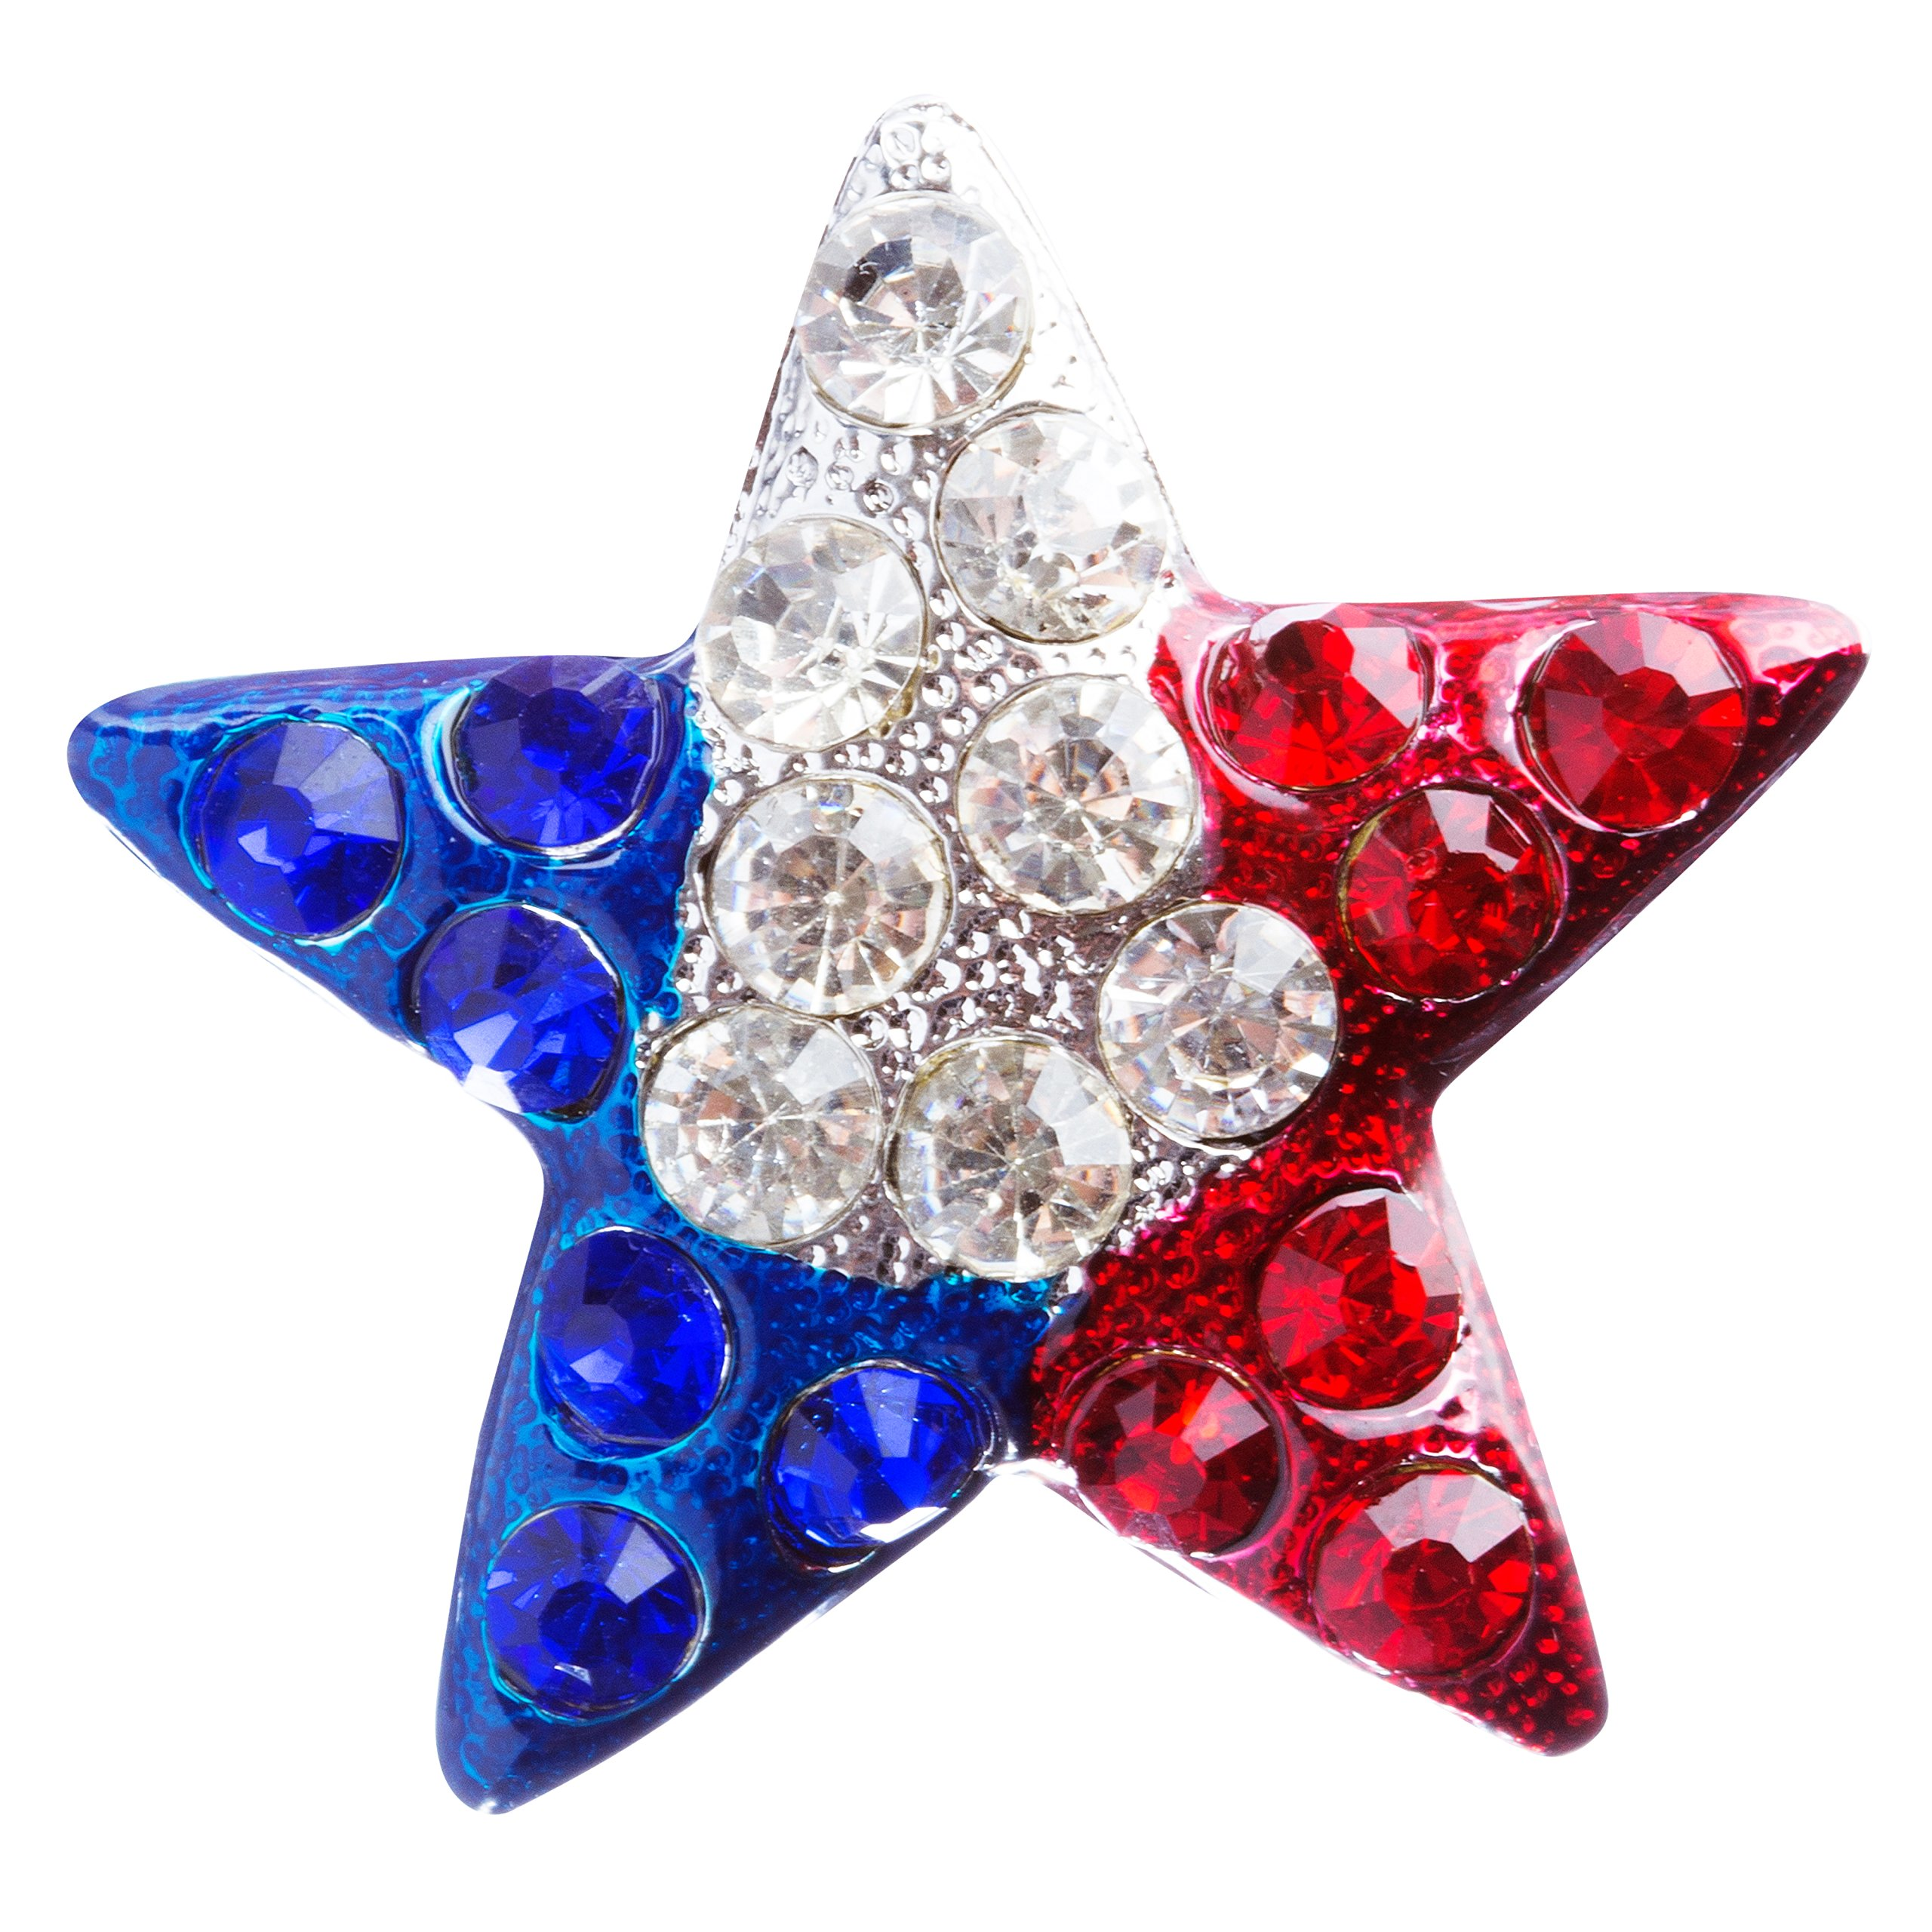 ACCESSORIESFOREVER Women Patriotic Jewelry Crystal Rhinestone Fascinating Star Design Pin BH109 Silver